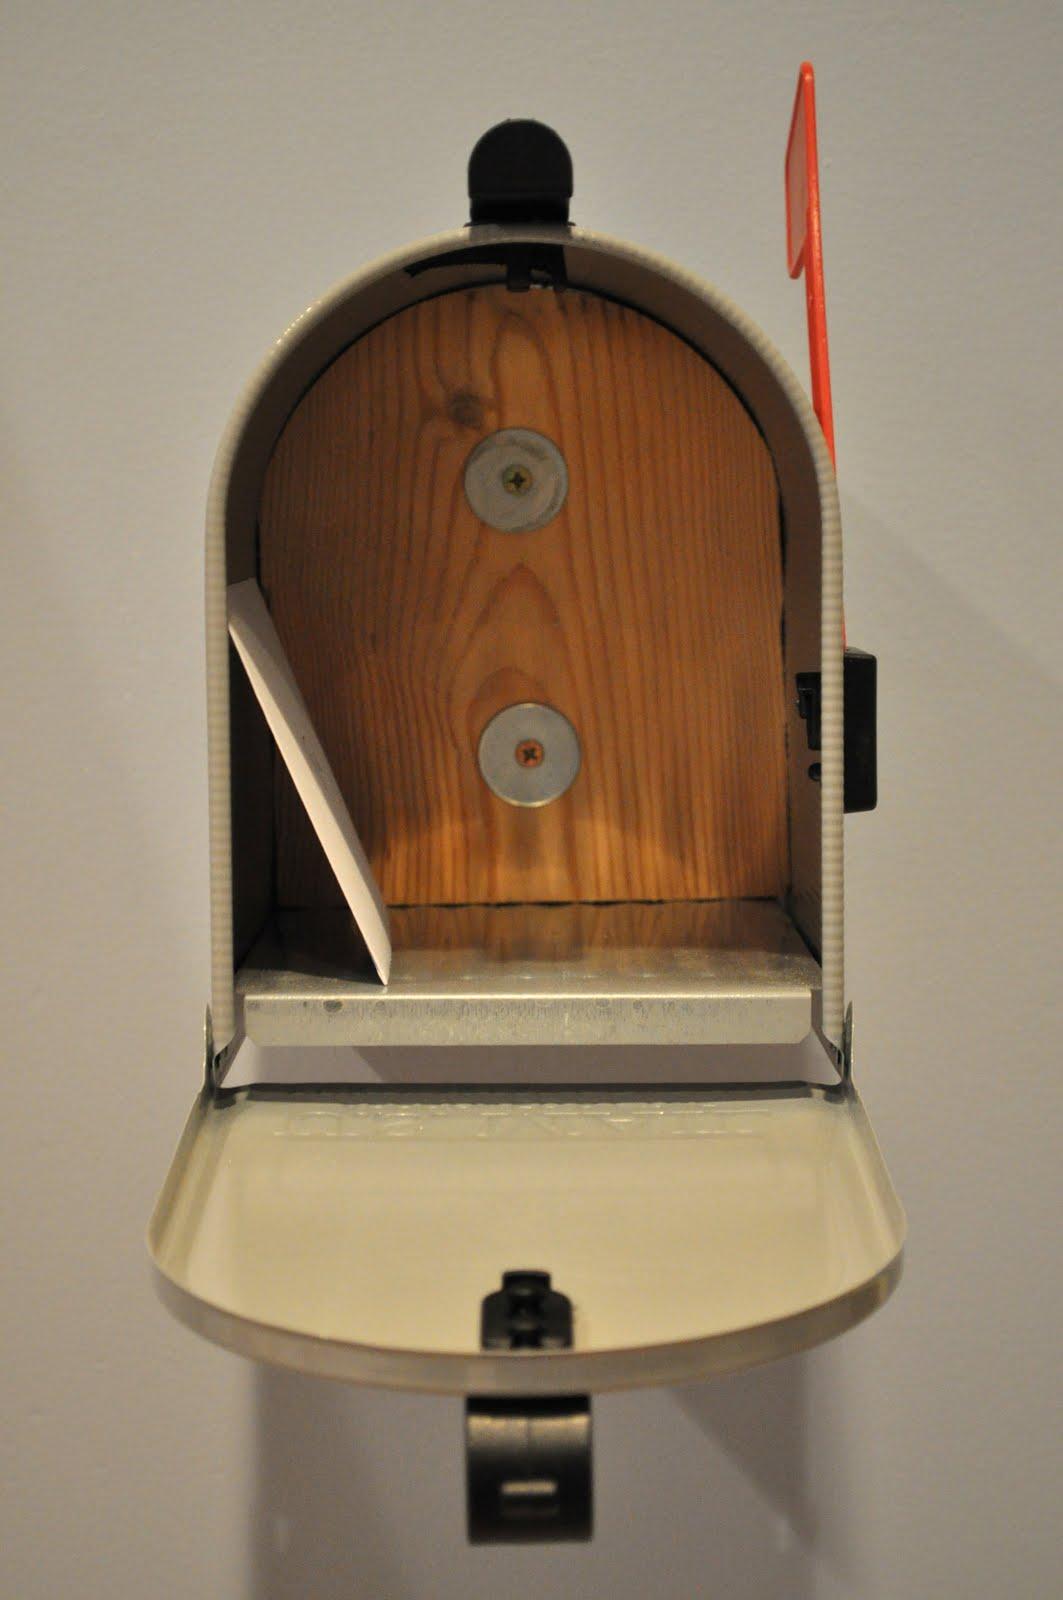 Built-In Playroom Wall Mailbox Design